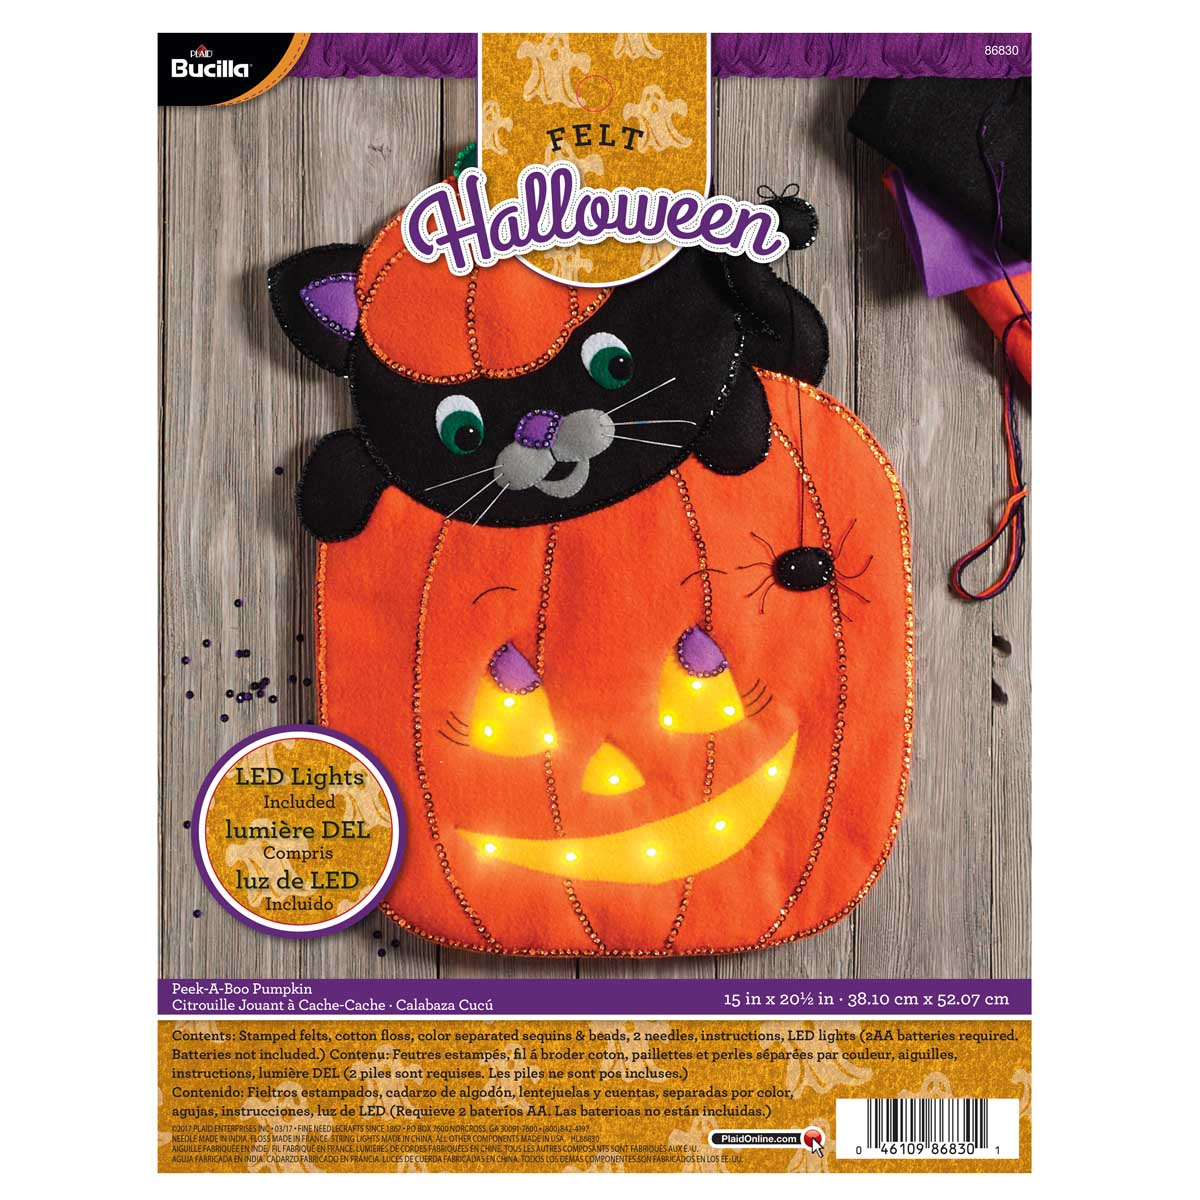 Bucilla ® Seasonal - Felt - Home Decor - Peek-A-Boo Pumpkin Wall Hanging with Lights - 86830